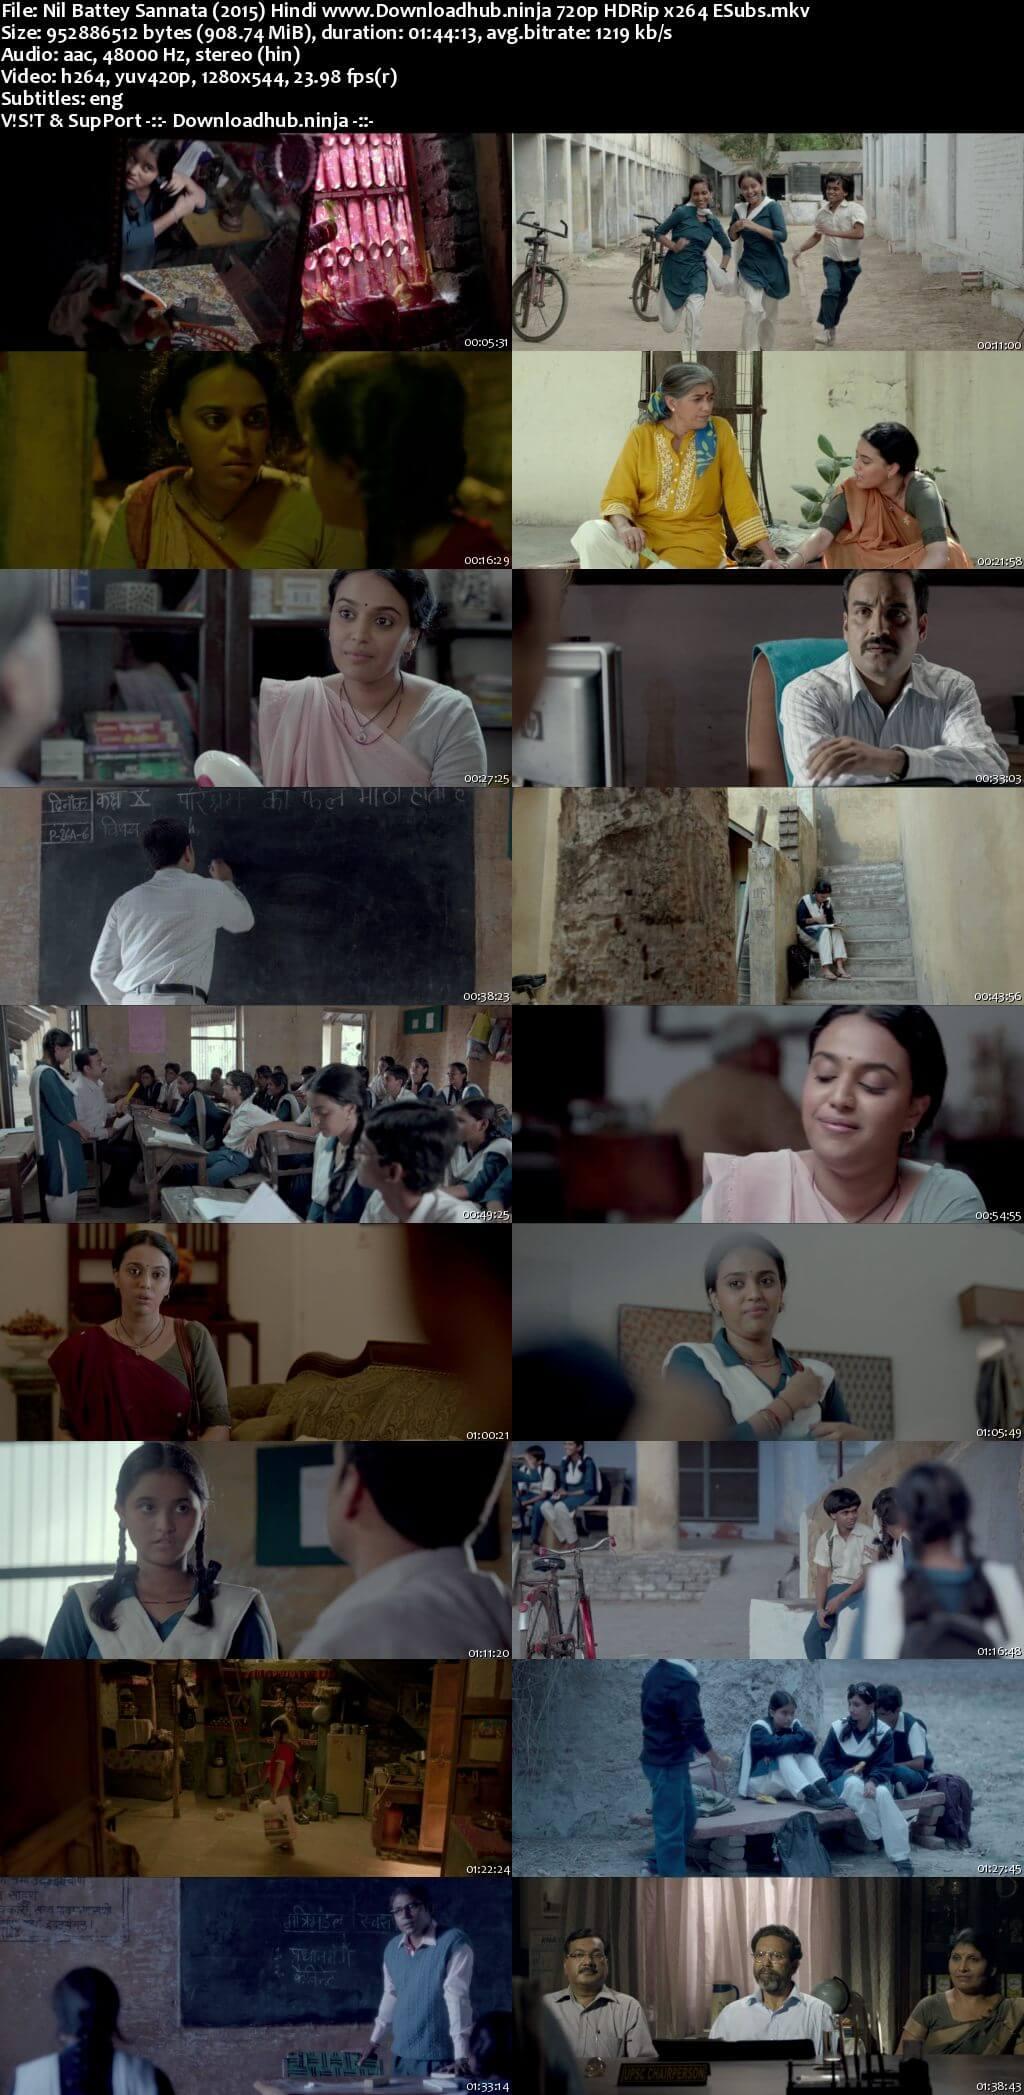 Nil Battey Sannata 2015 Hindi 720p HDRip ESubs